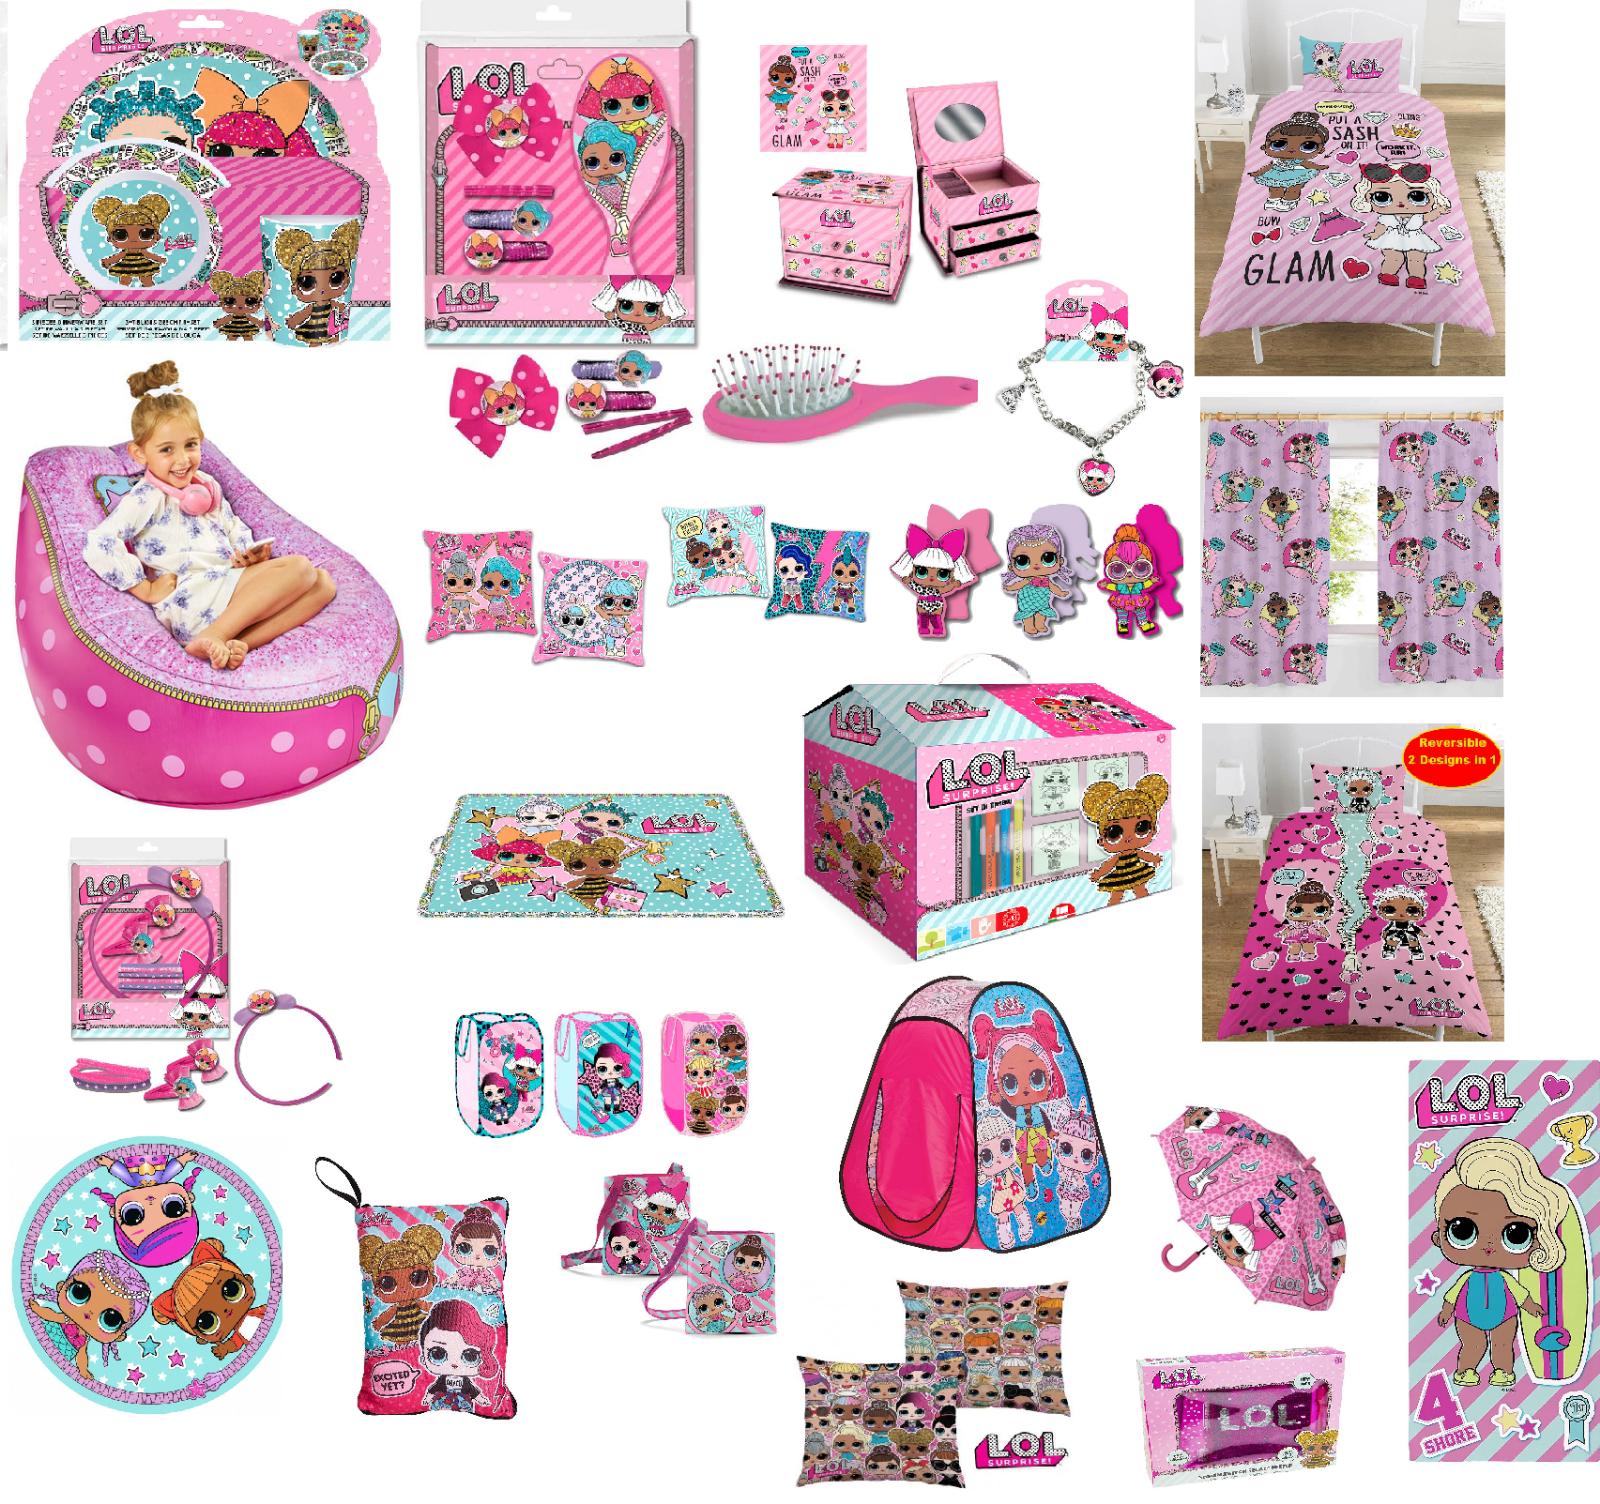 Children's Lol Surprise Pink Accessories Activity Dinner Party Gift Idea Bedding 2